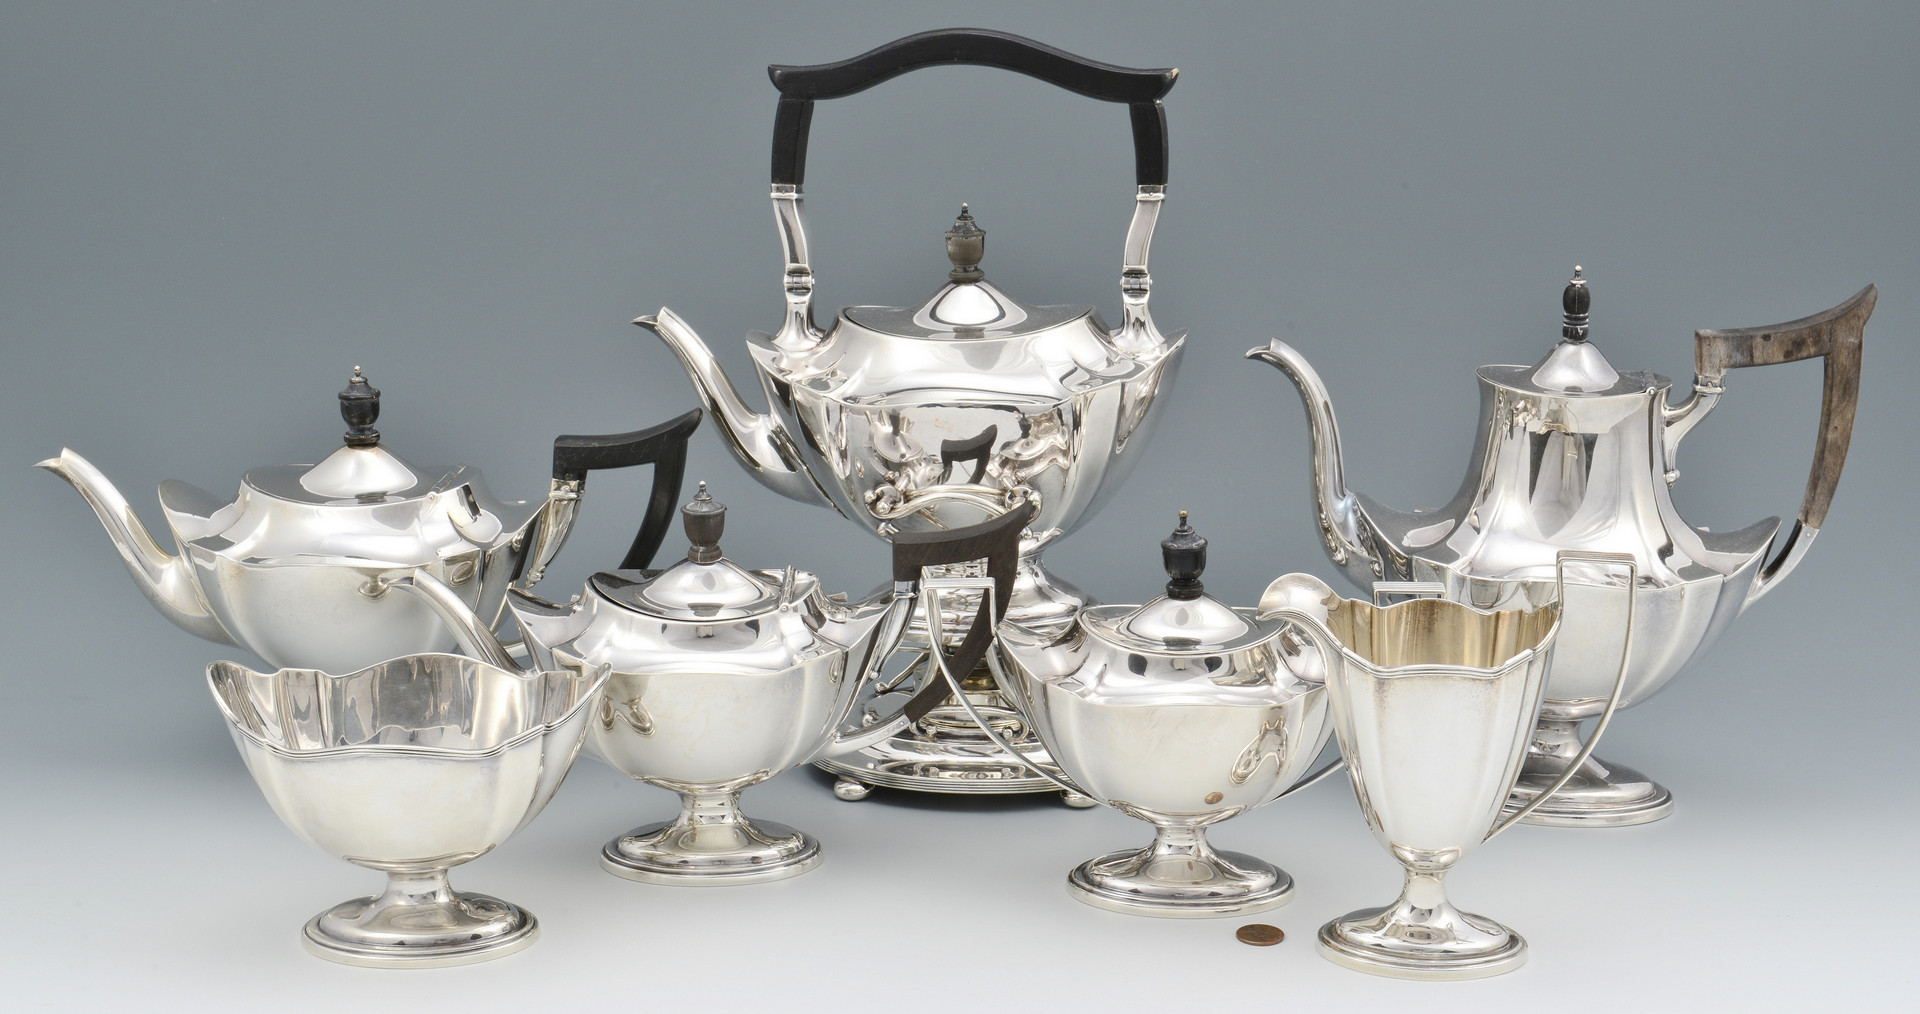 Lot 98: Gorham Sterling Tea Service, 7 pcs.